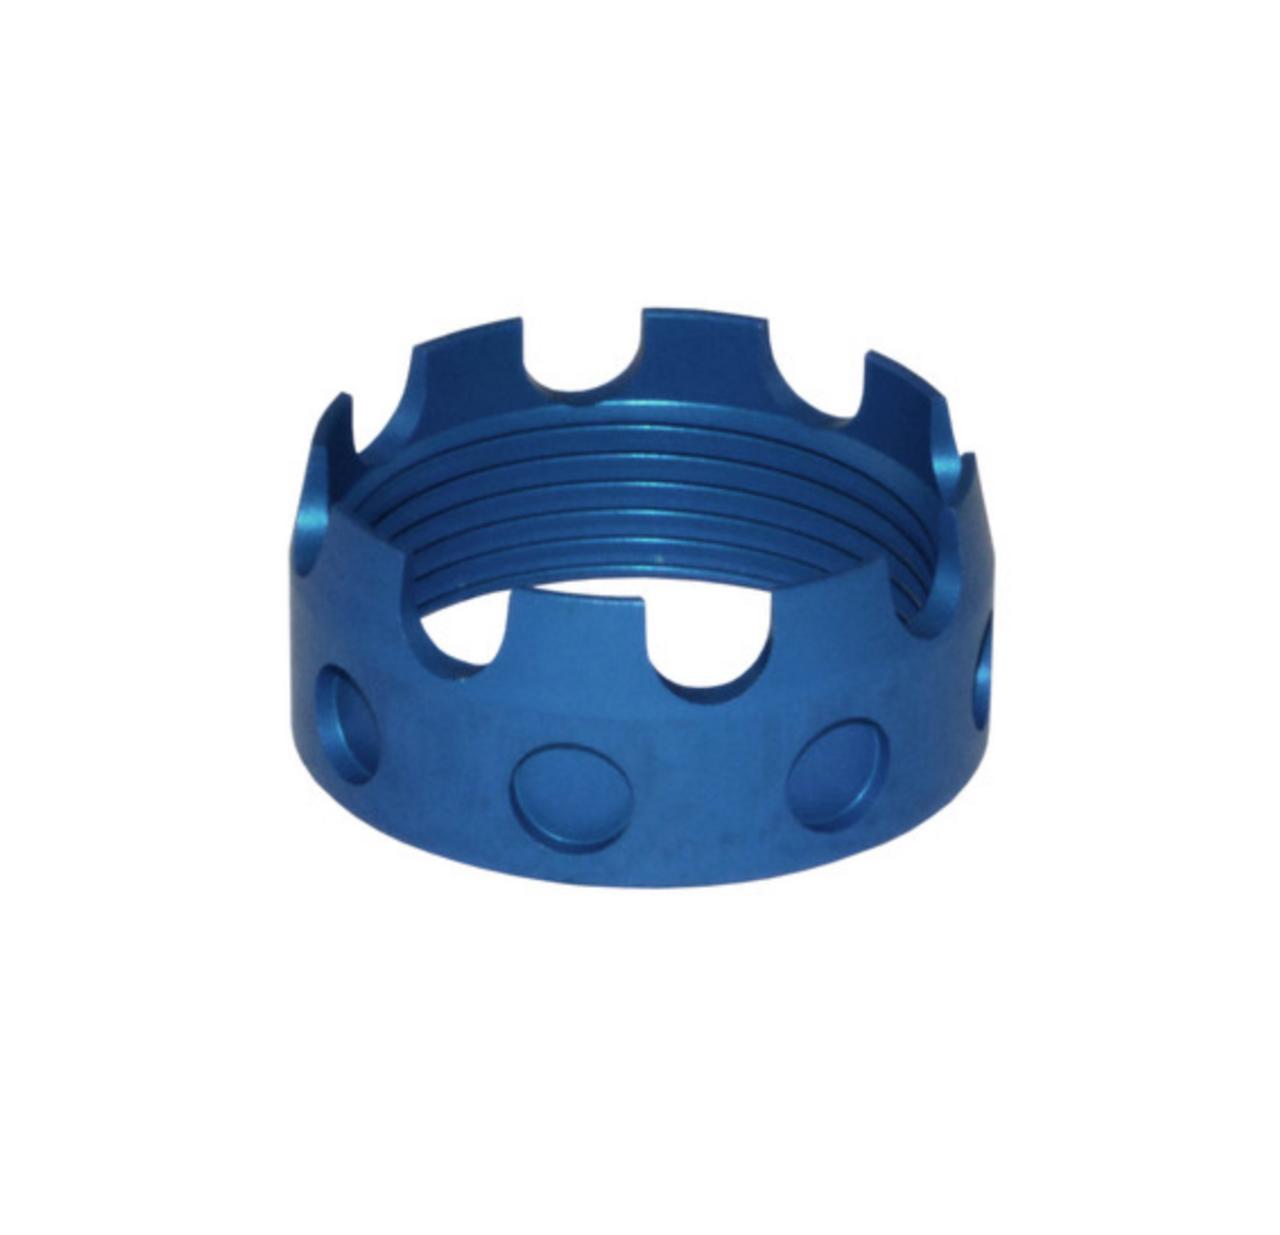 Aluminum Castle Nut for AR .223/5.56/.308 Buffer Tube Receiver End Plates